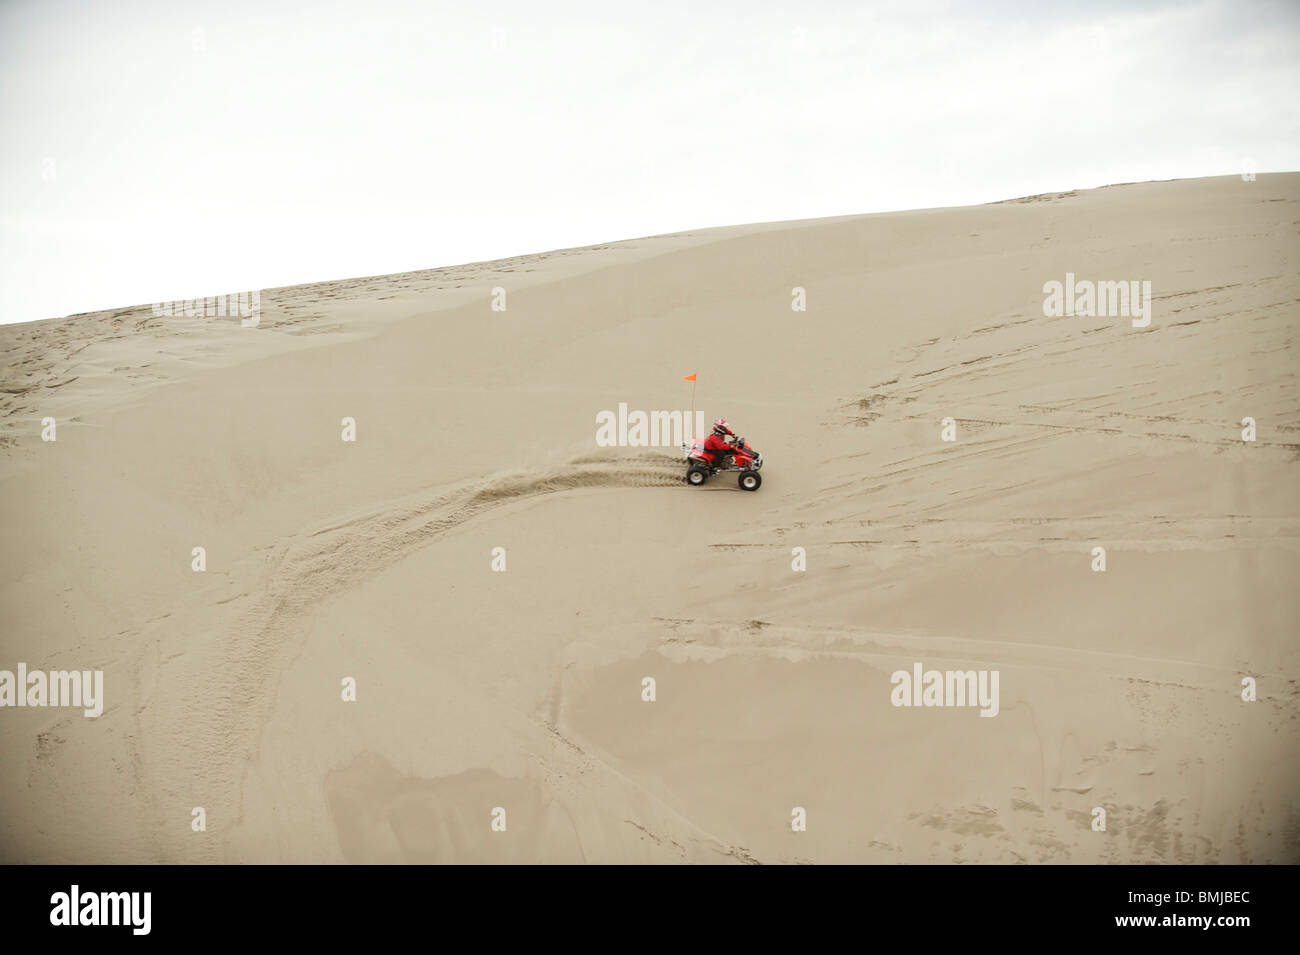 Dune buggies, quad bikes, ATCs and dirt bikes, ride through sand dunes in St. Anthony, Idaho, USA. - Stock Image